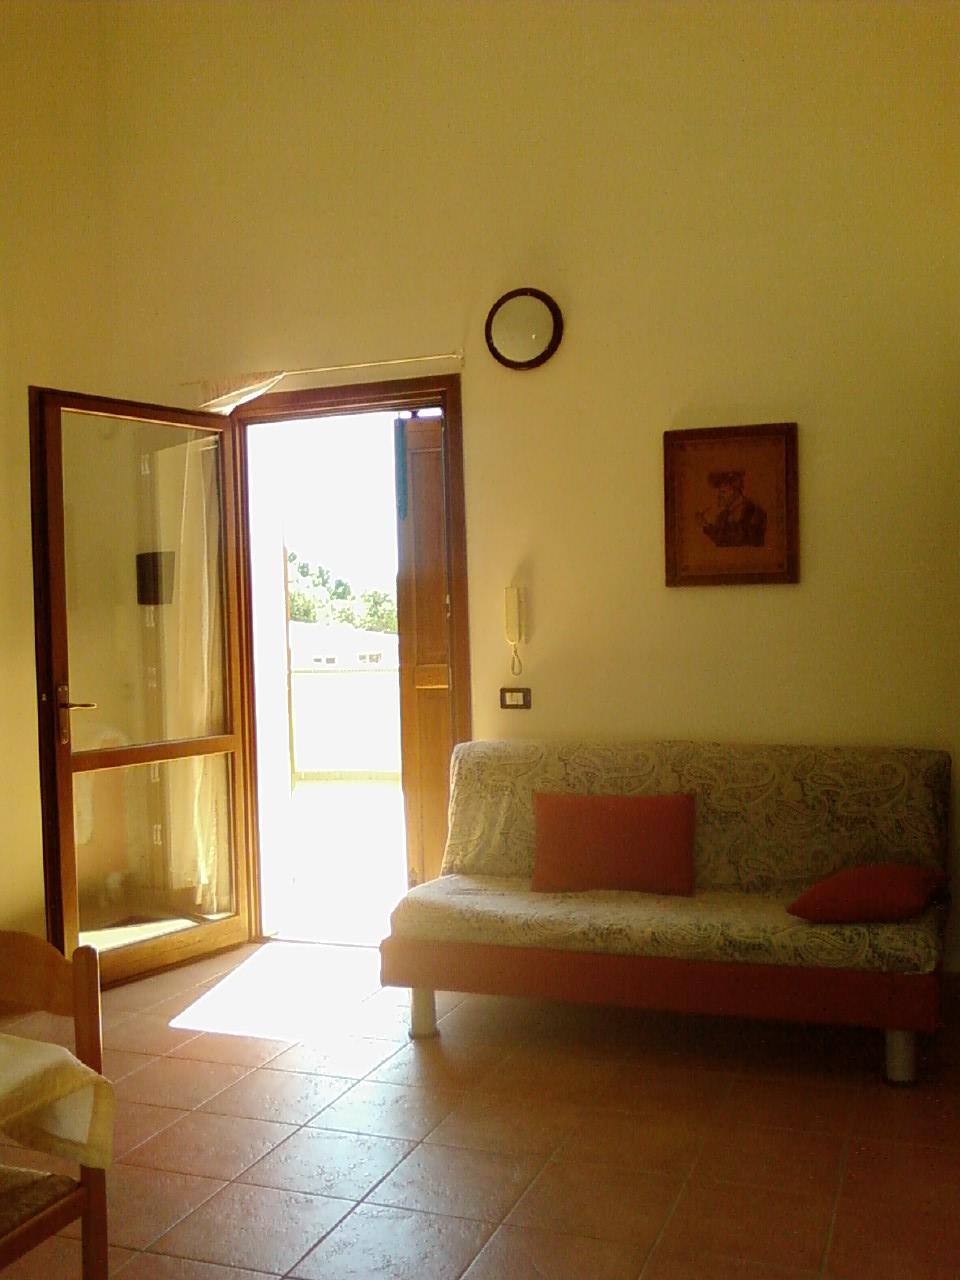 affitto appartamento mare castiadas 5304 (20110303100357-2011-15286-NDP.jpg)